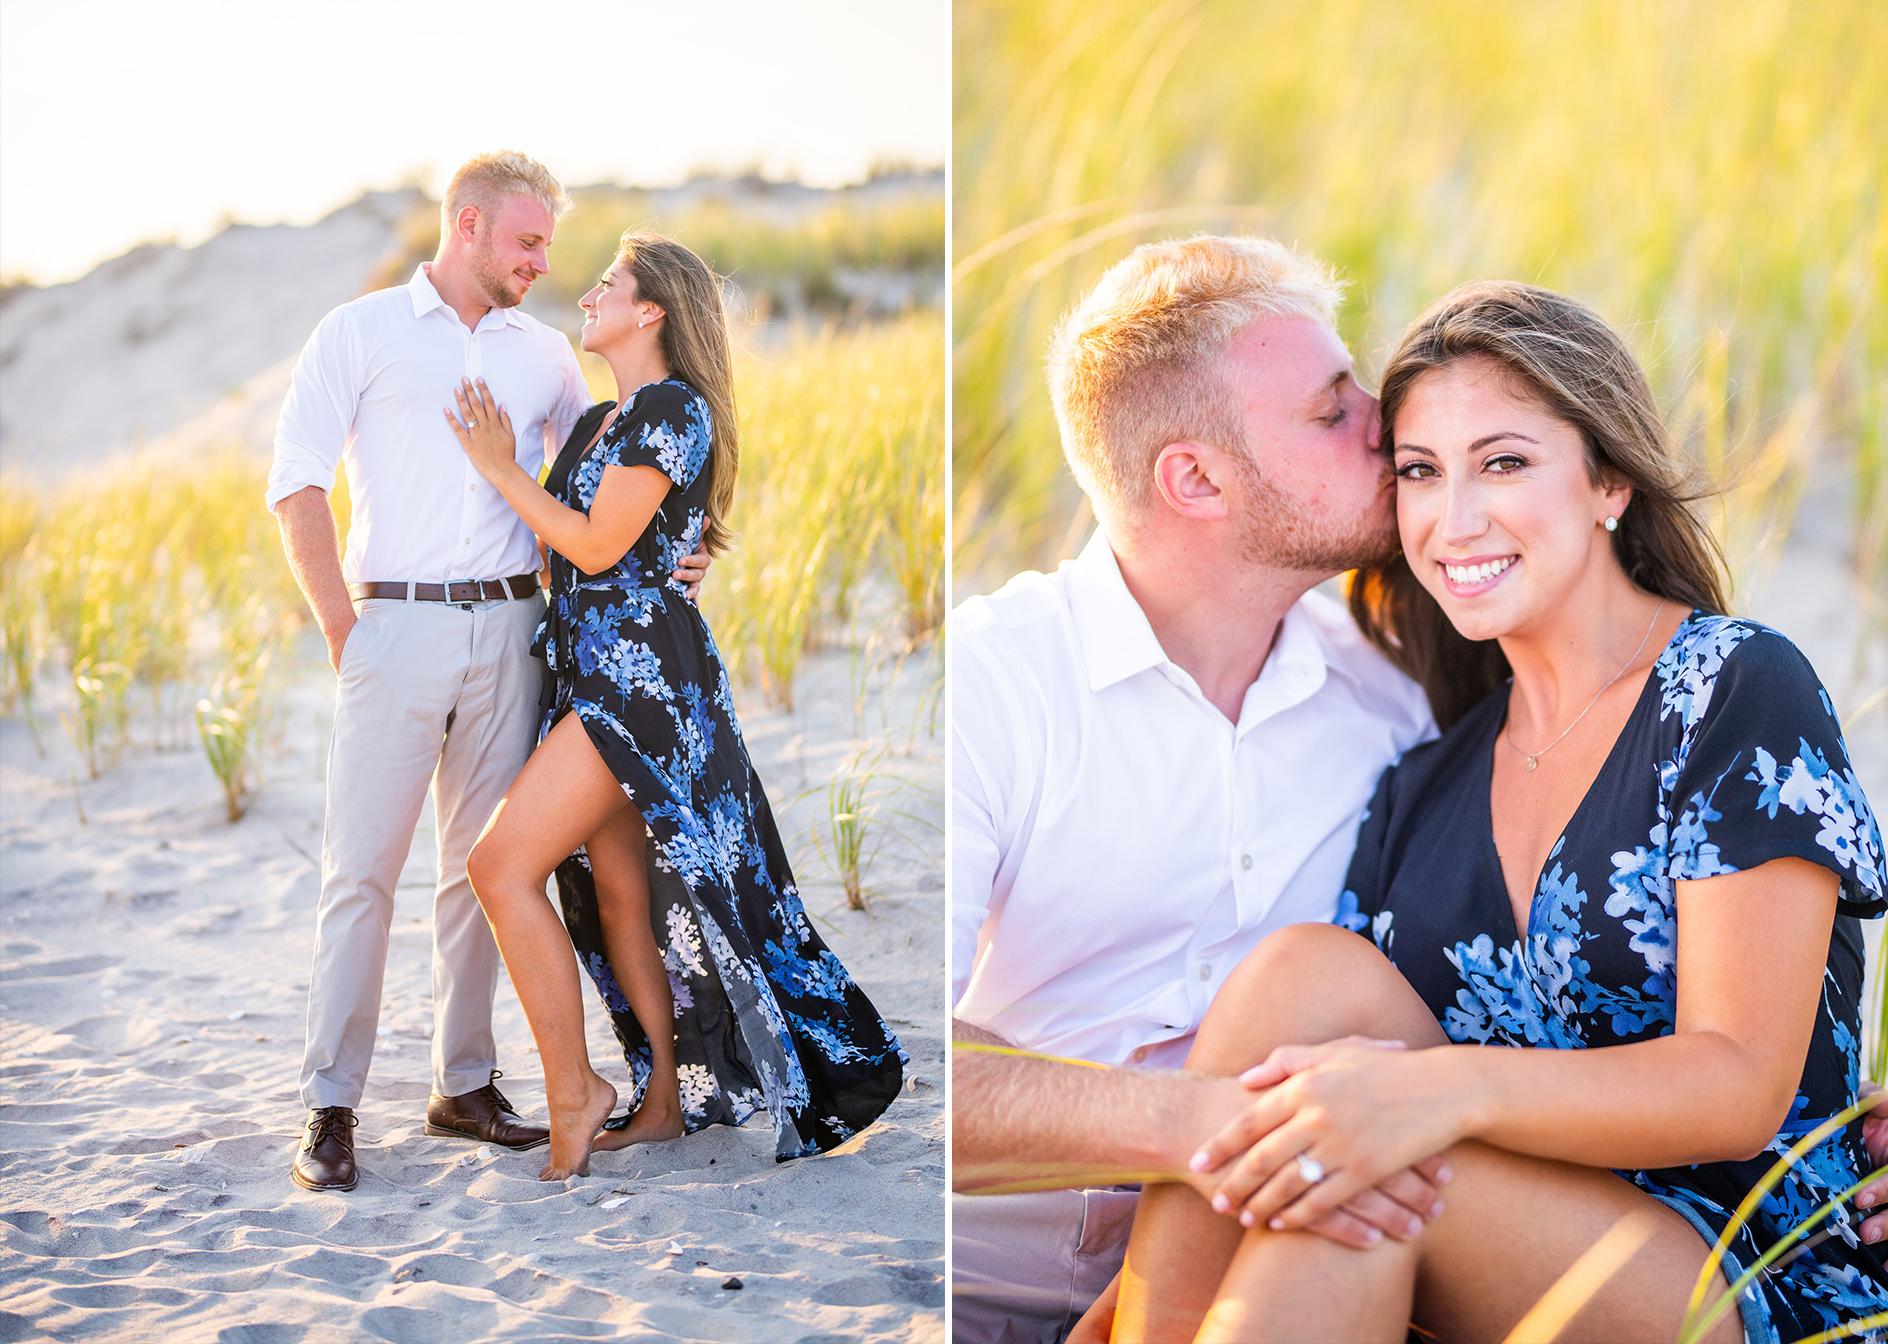 Dune Road Engagement Shoot | Westhampton Beach Engagement Shoot | Hamptons Wedding Photographer4